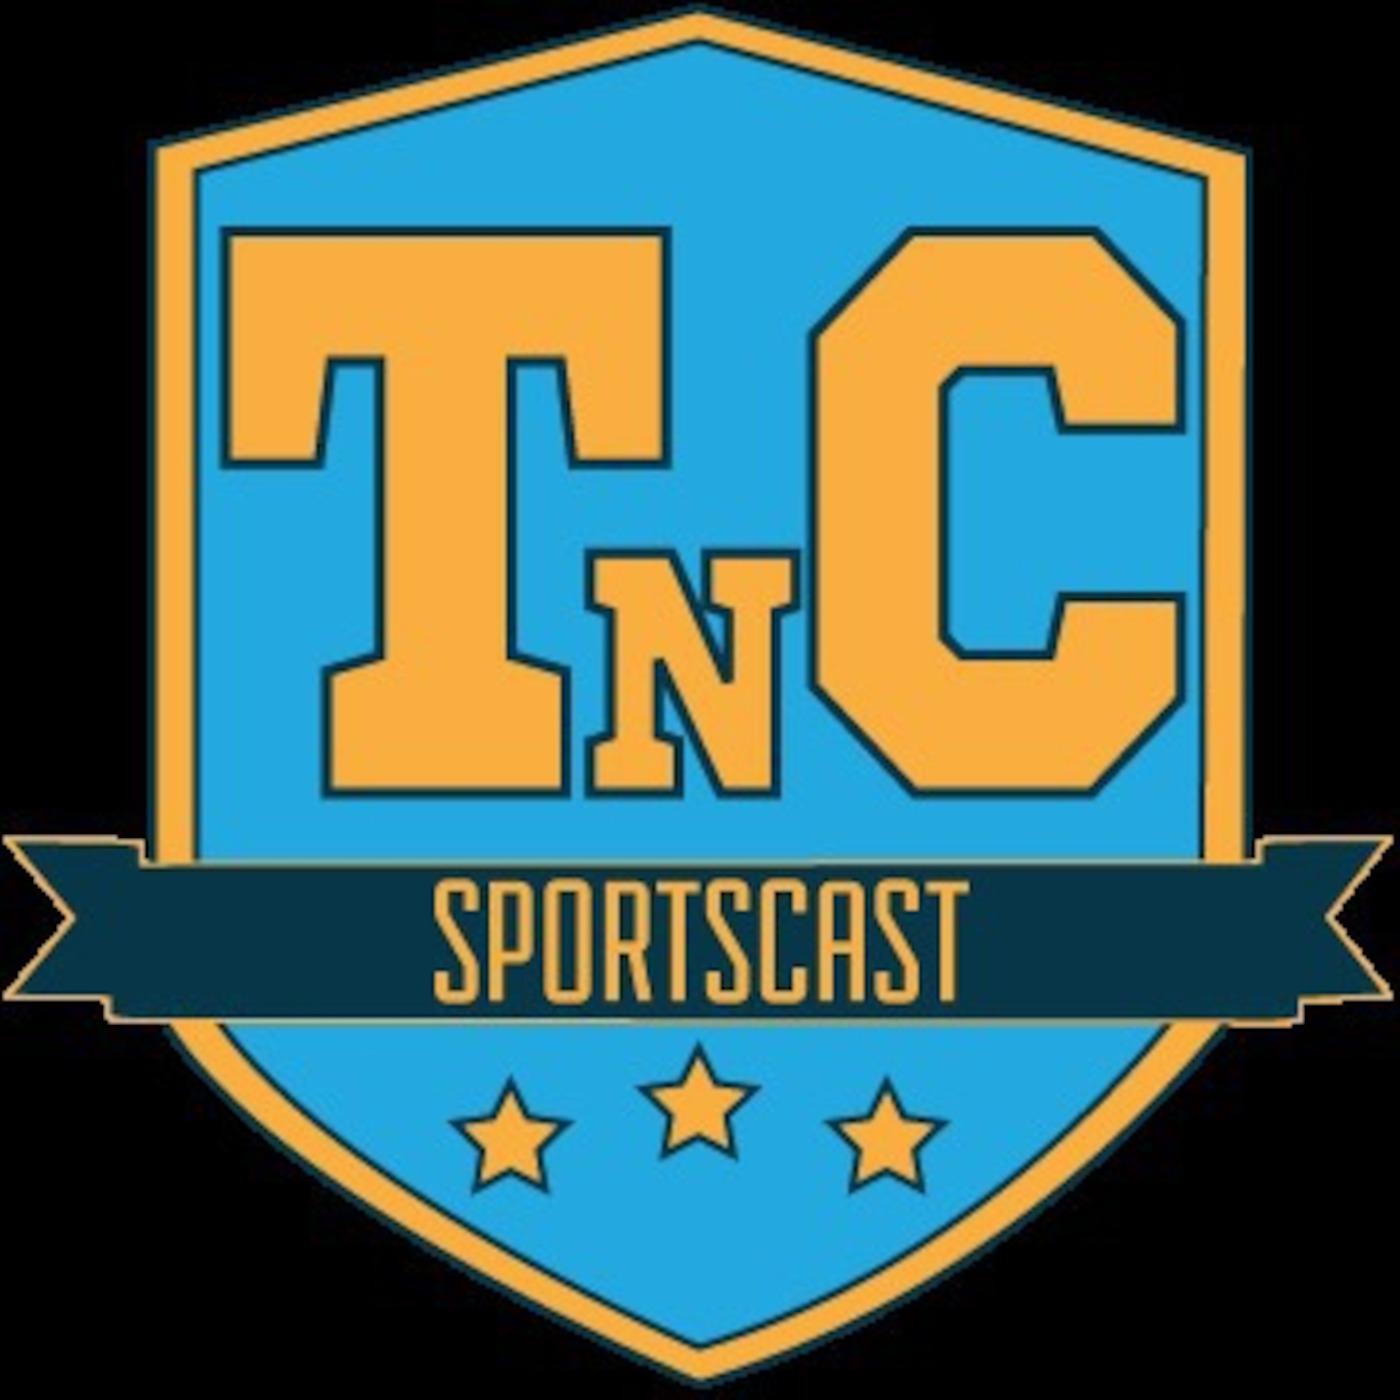 TnC Sportscast